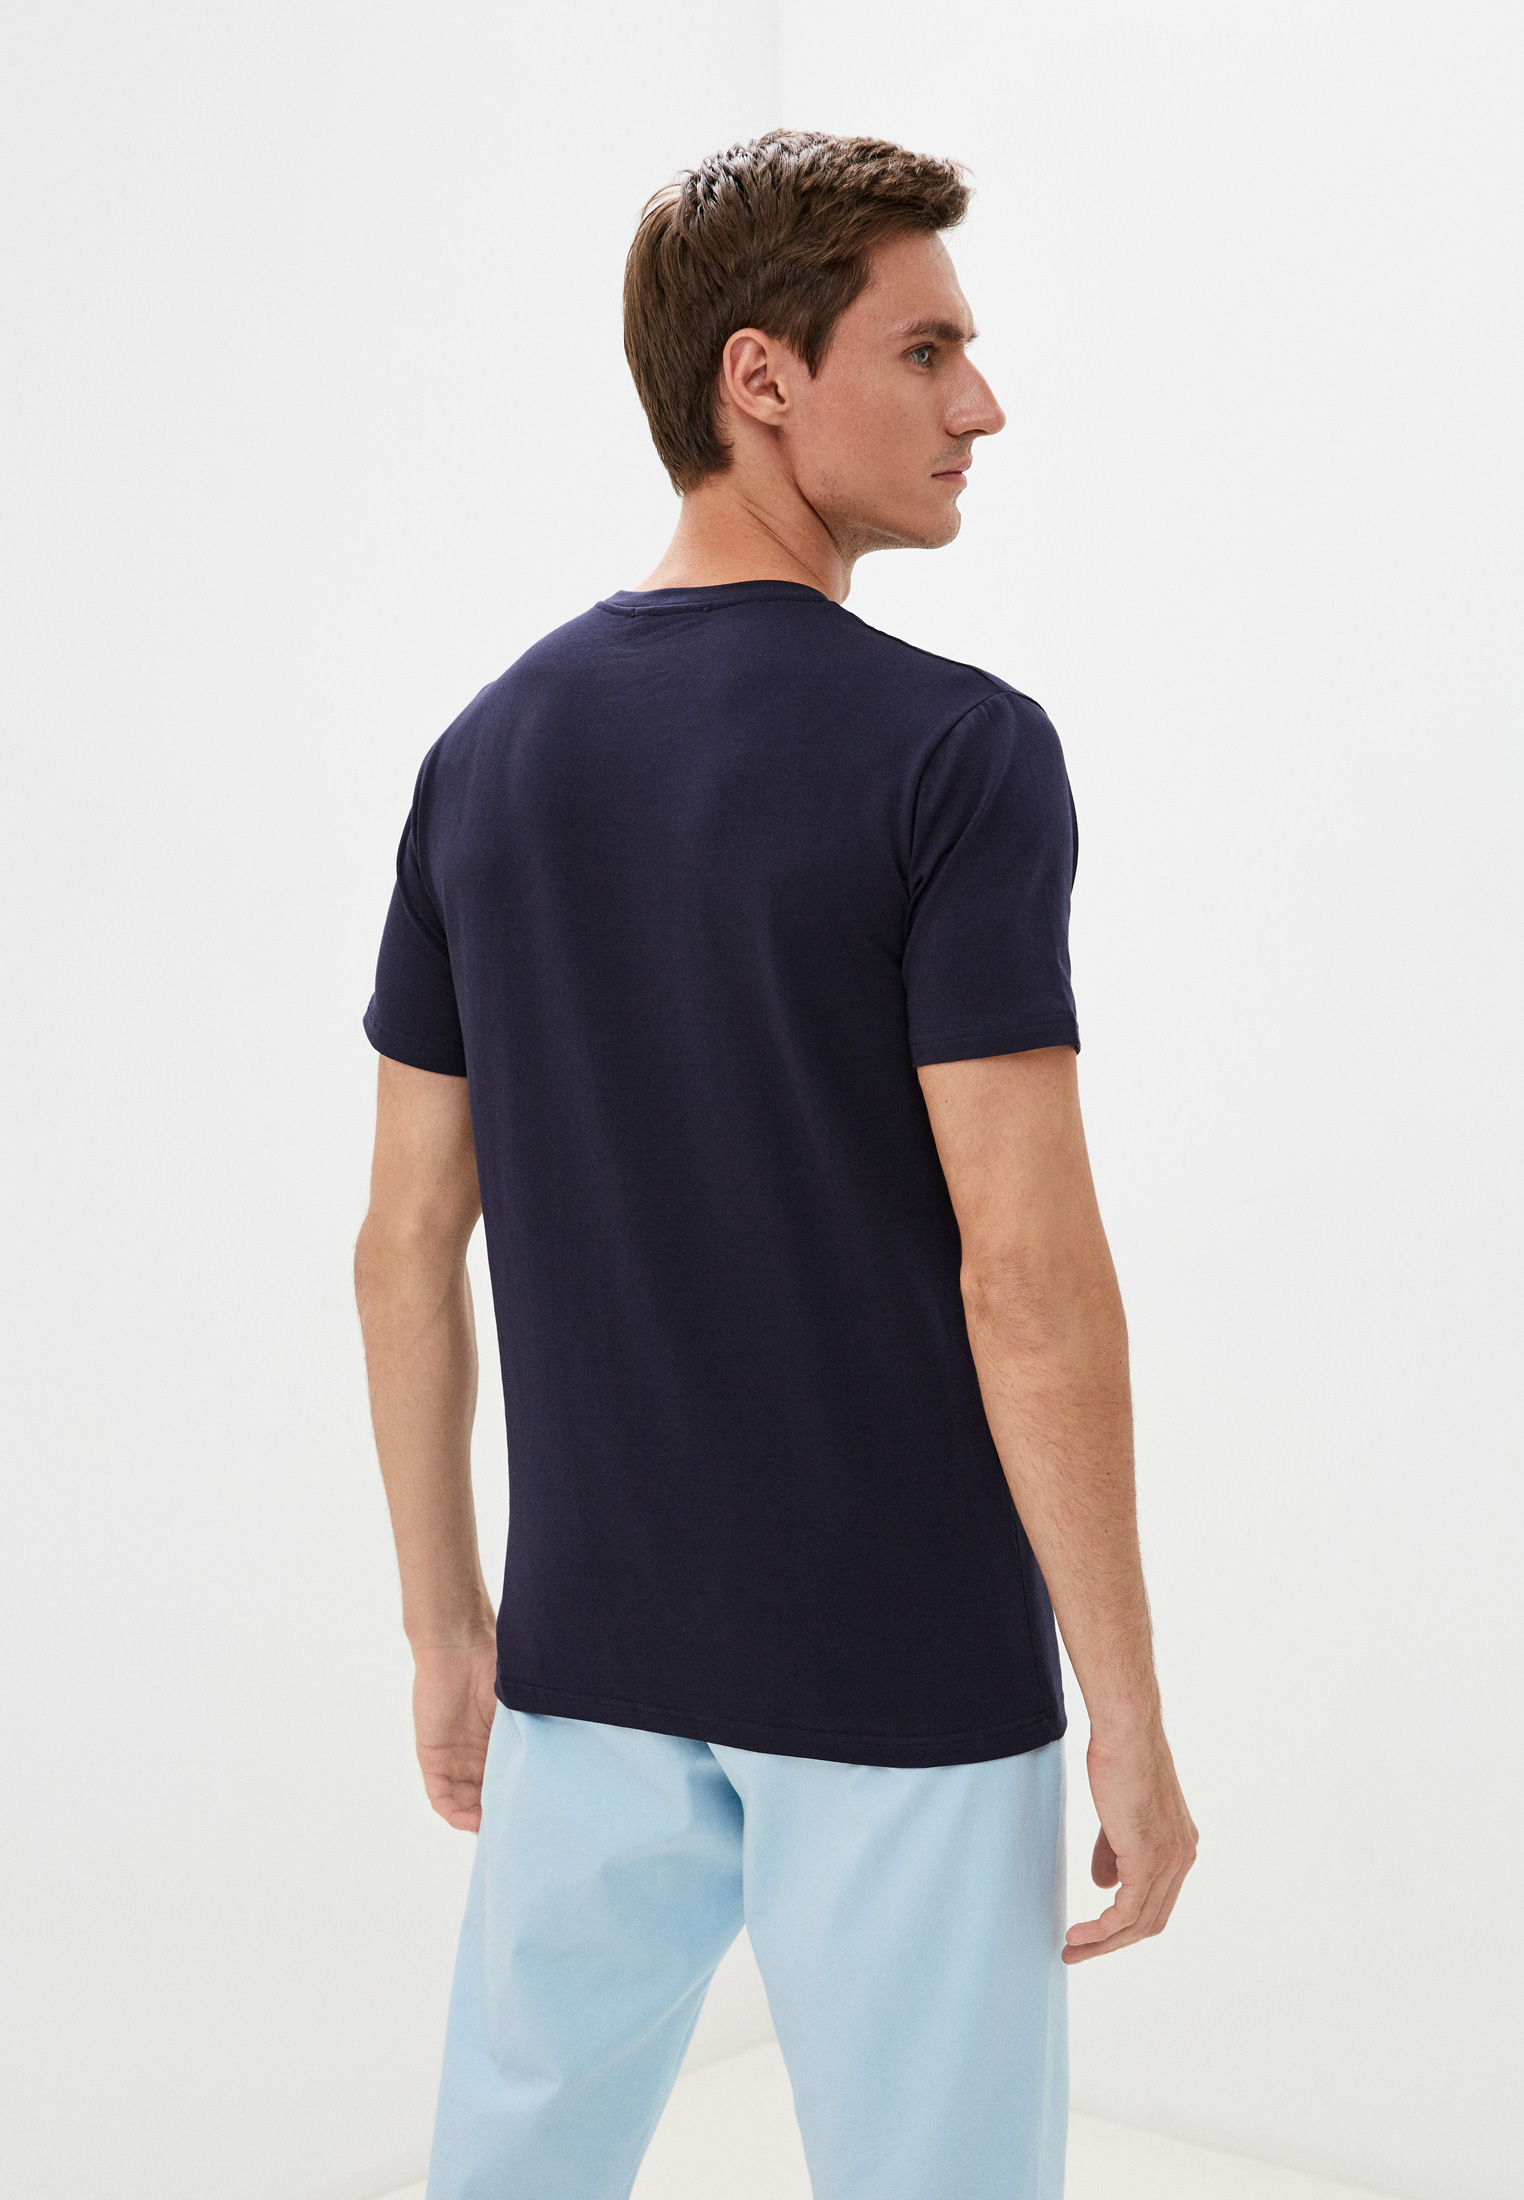 Мужская футболка Baldinini (Балдинини) TSU01: изображение 4